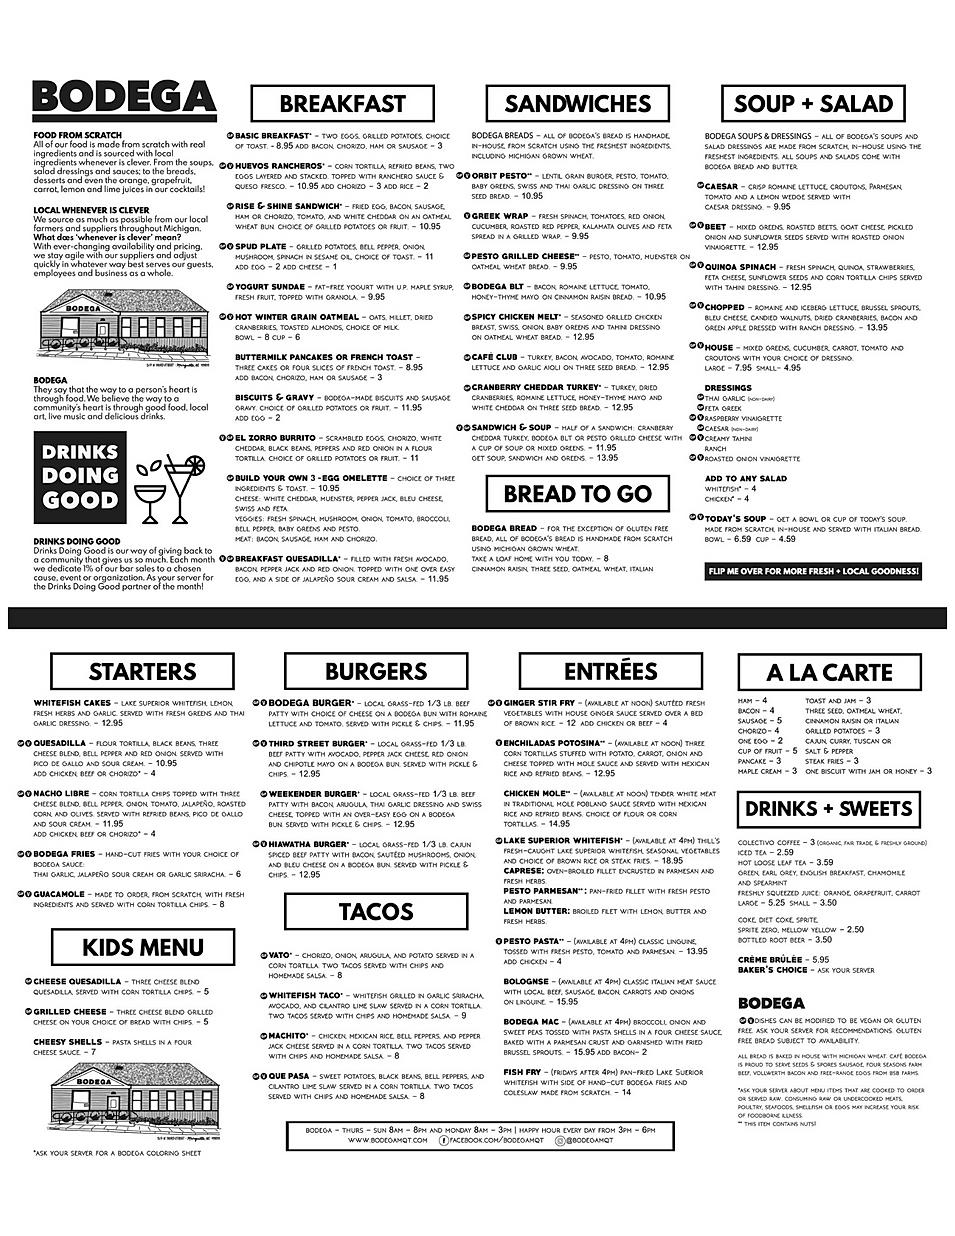 Bodega breakfast colectivo coffee Soup sandwiches restaurant menu hours location deals Marquette Now